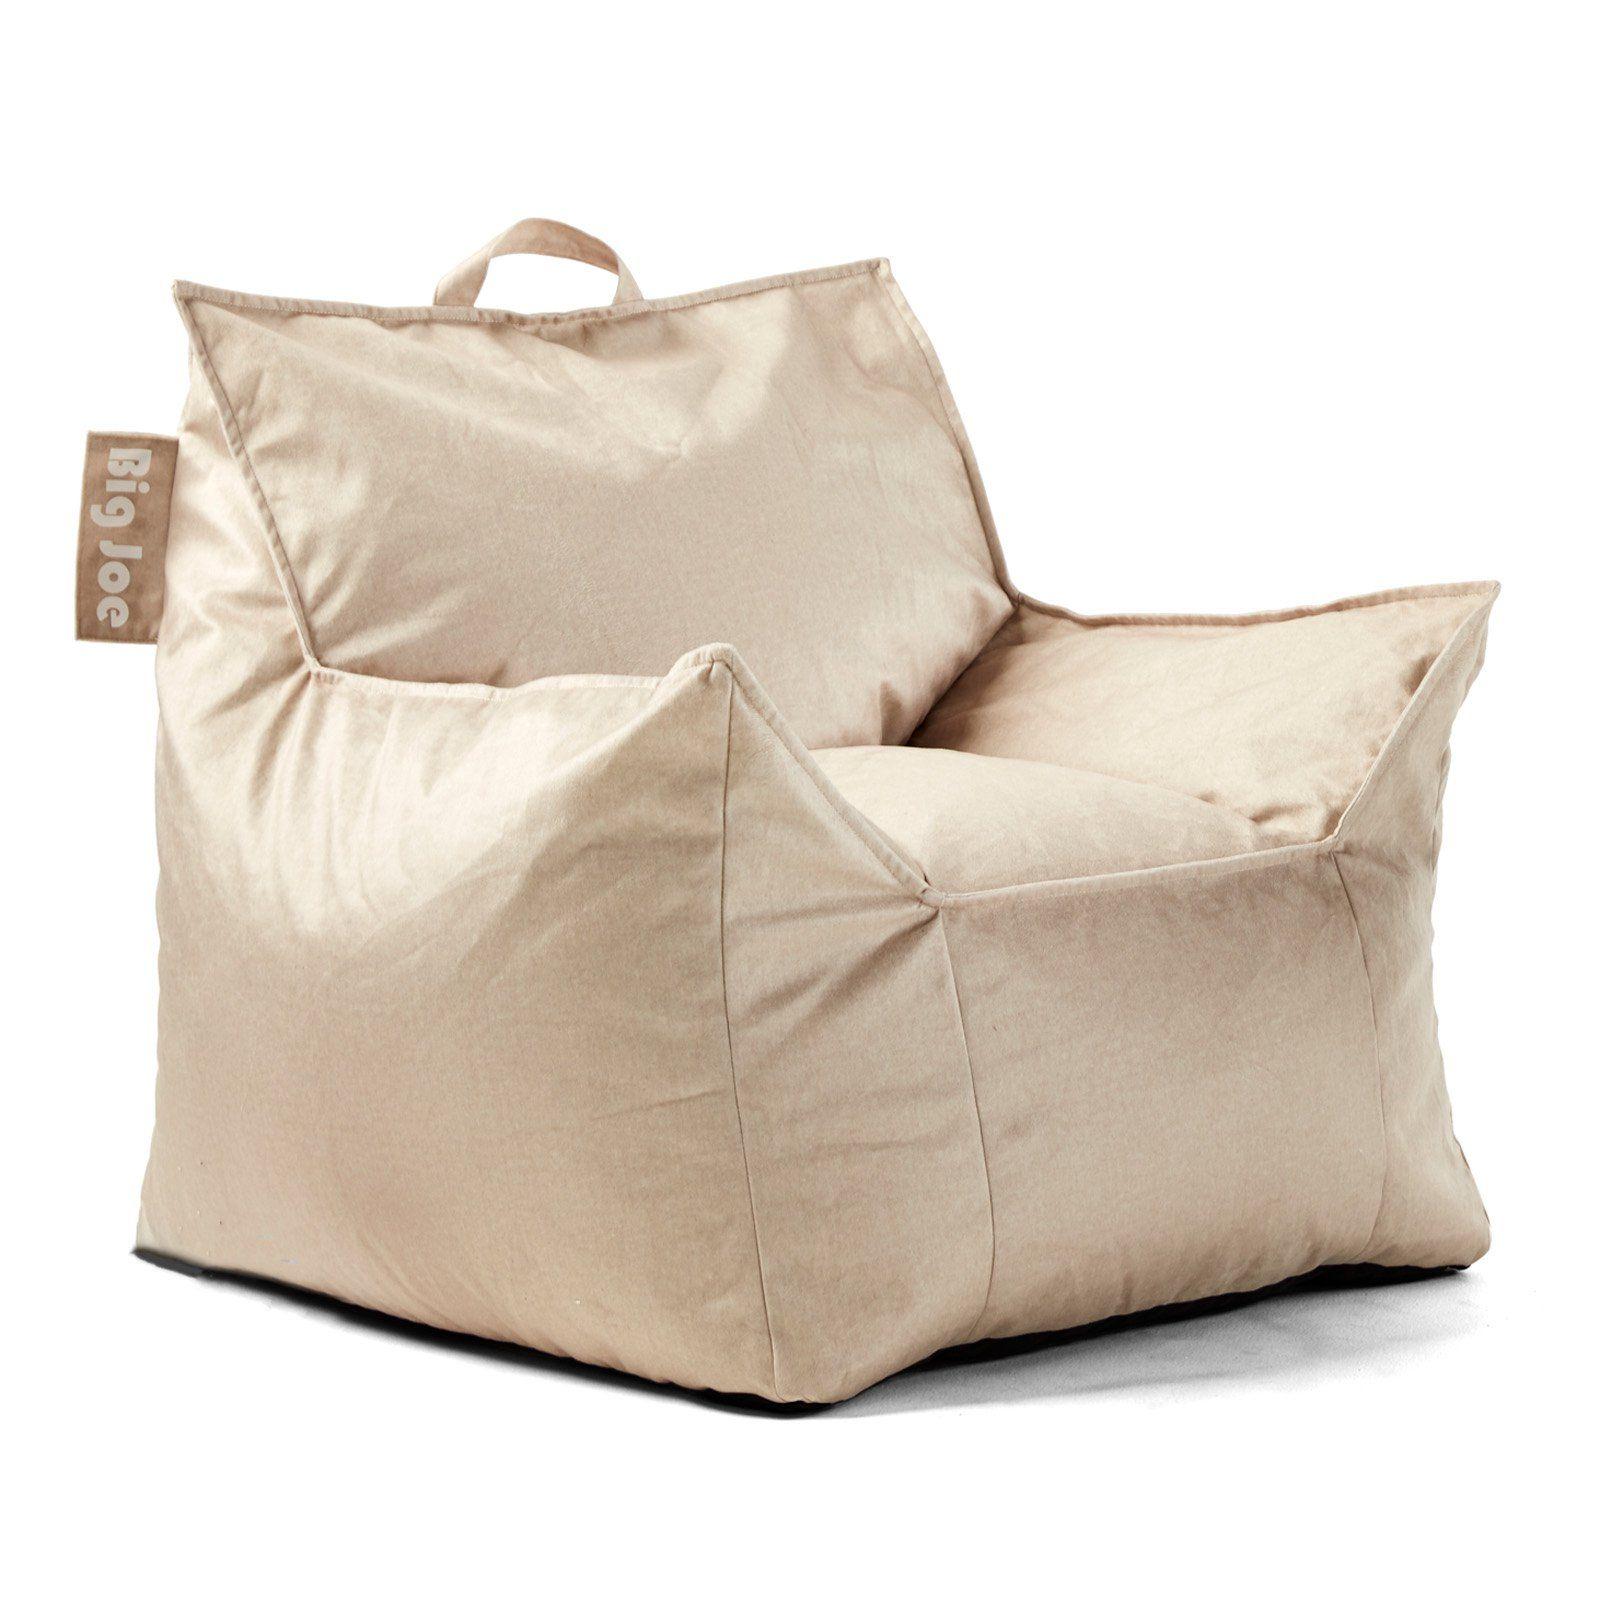 Fine Big Joe Mitten Bean Bag Chair Oat Products In 2019 Bean Theyellowbook Wood Chair Design Ideas Theyellowbookinfo